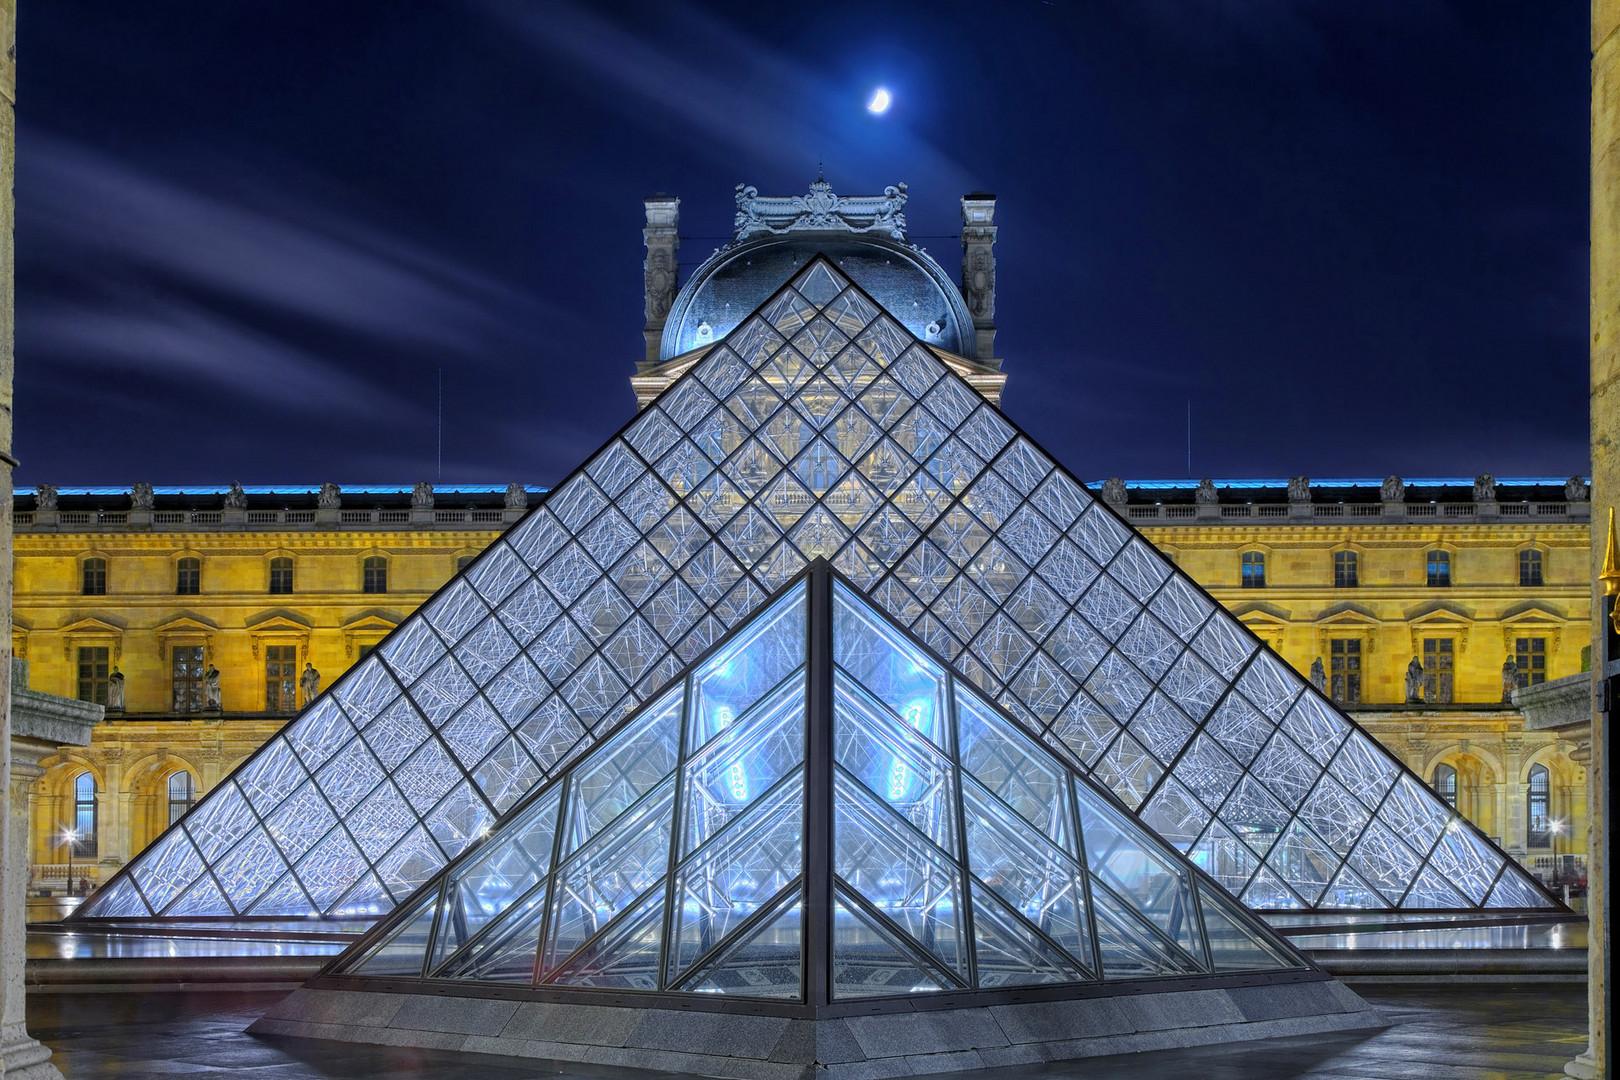 Pyramiden Louvre Paris beleuchtet